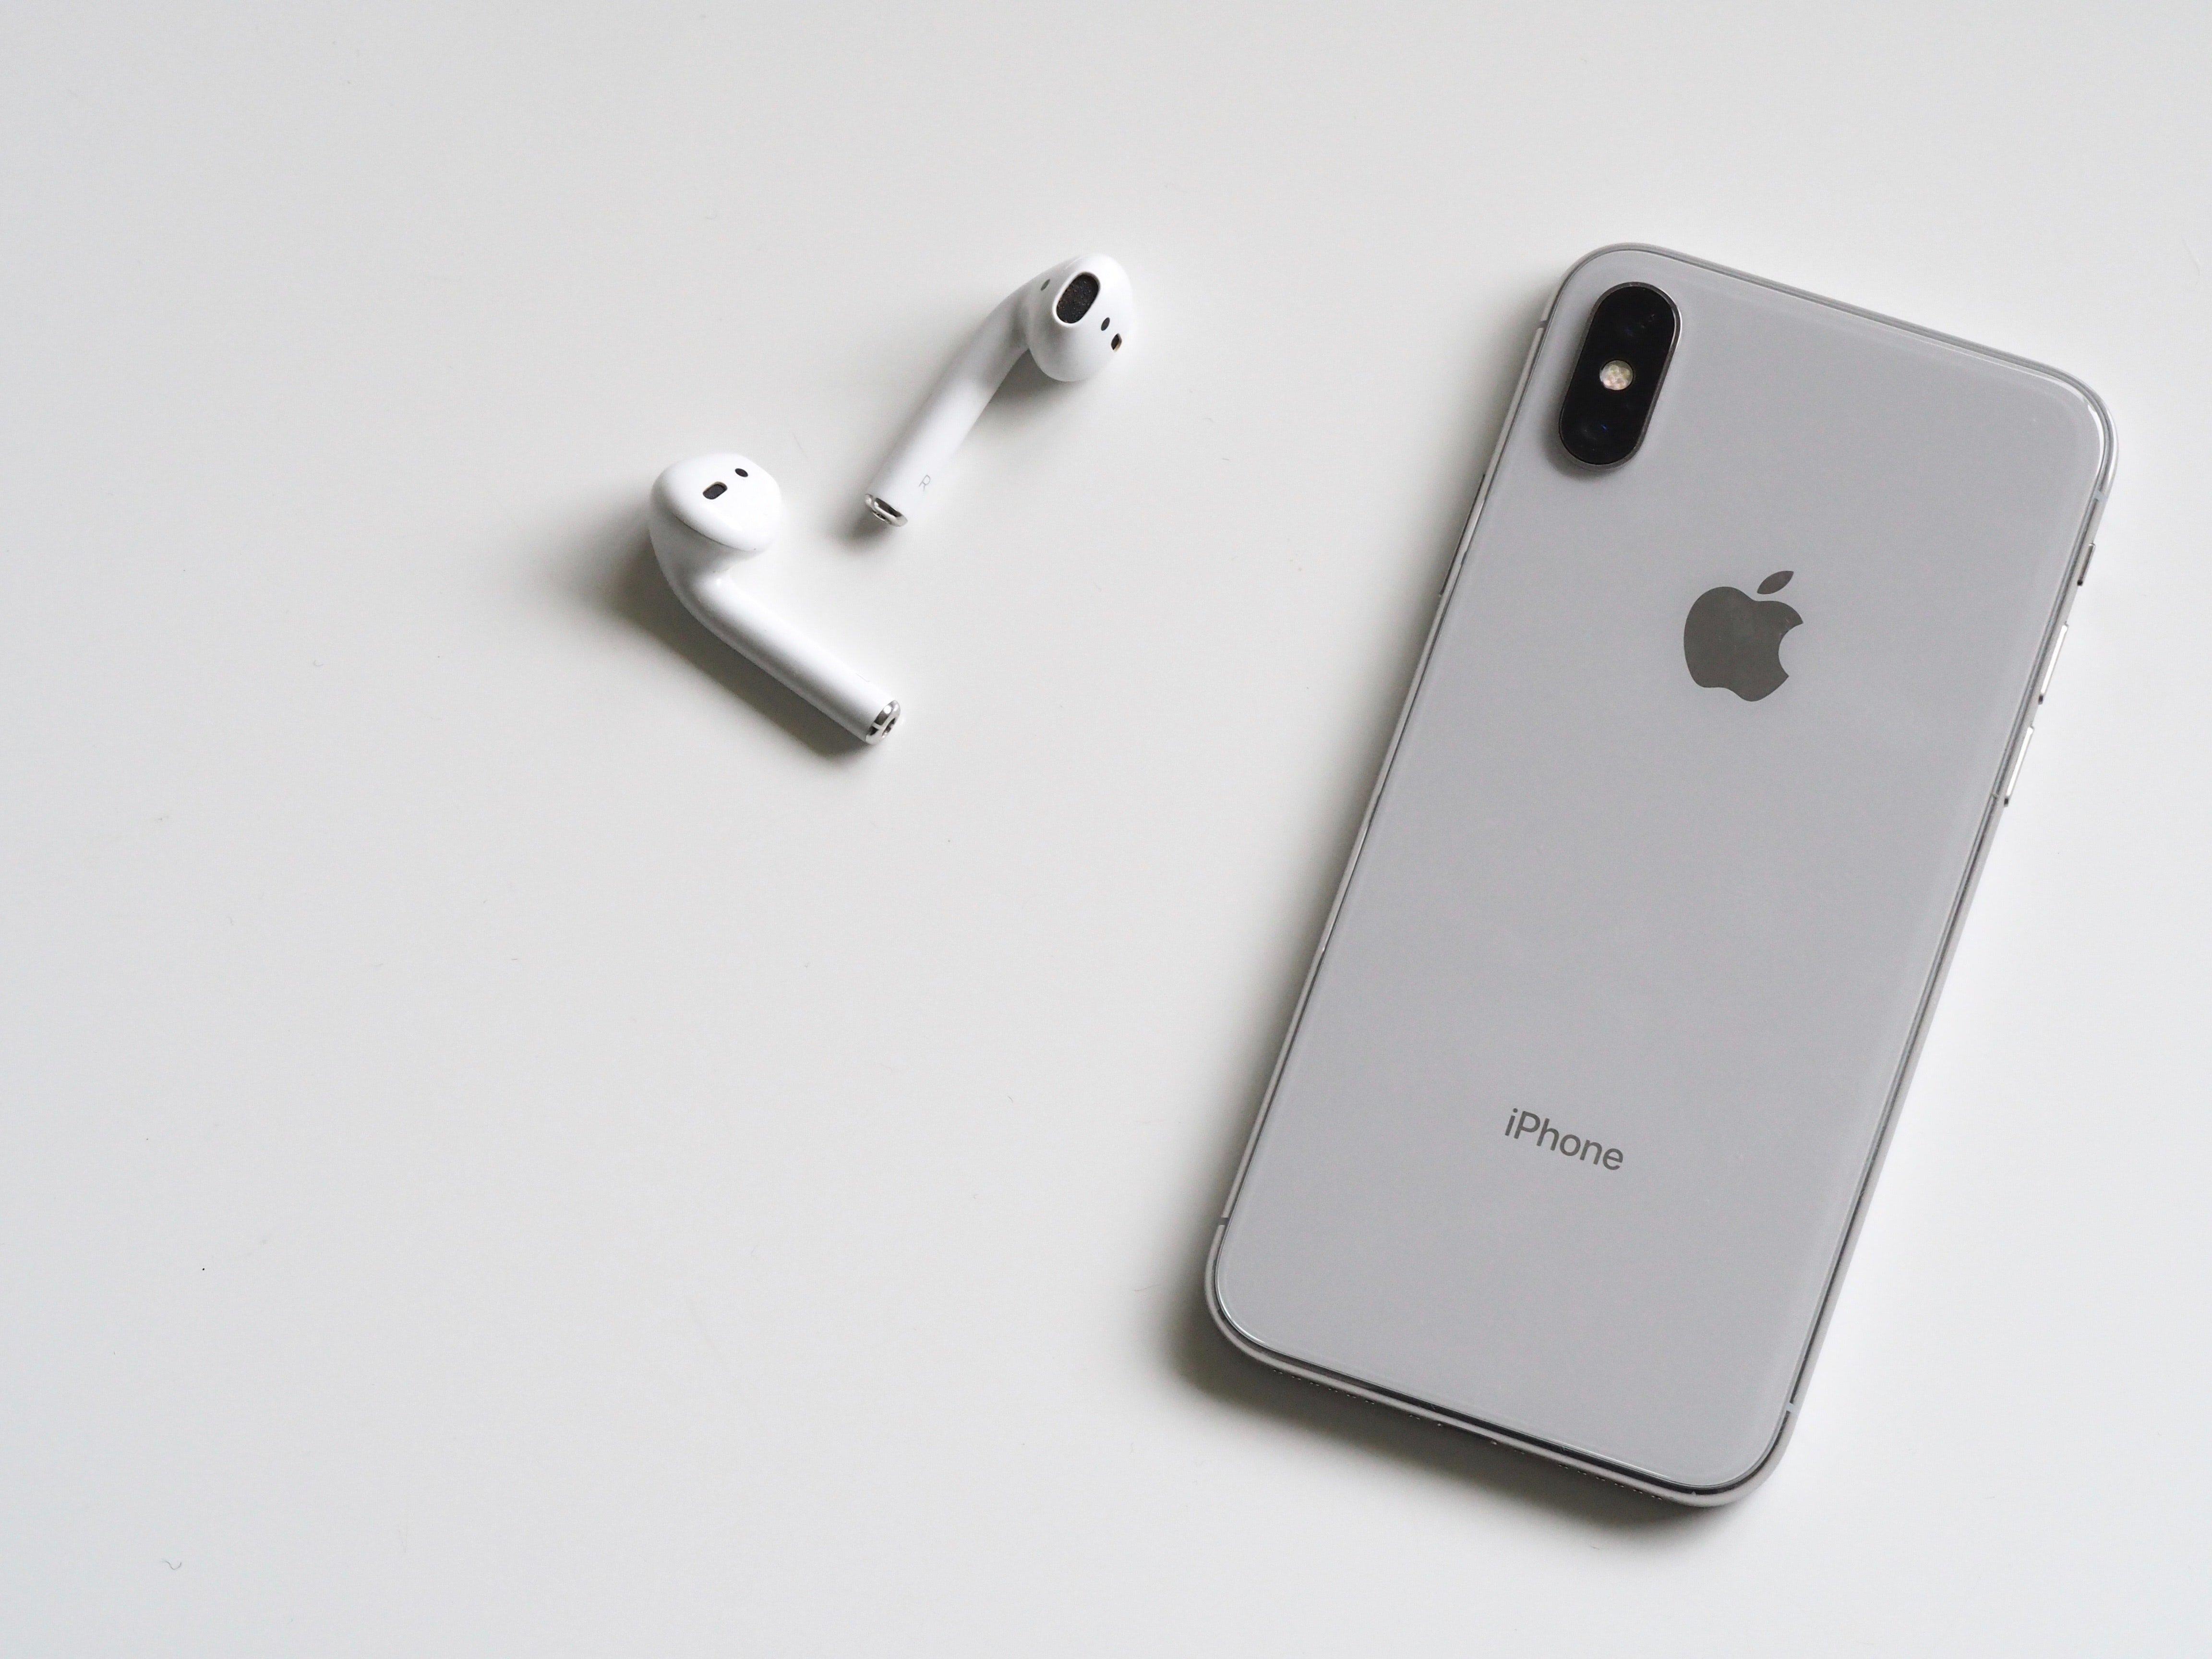 airpods-apple-device-cellphone-788946.jpg